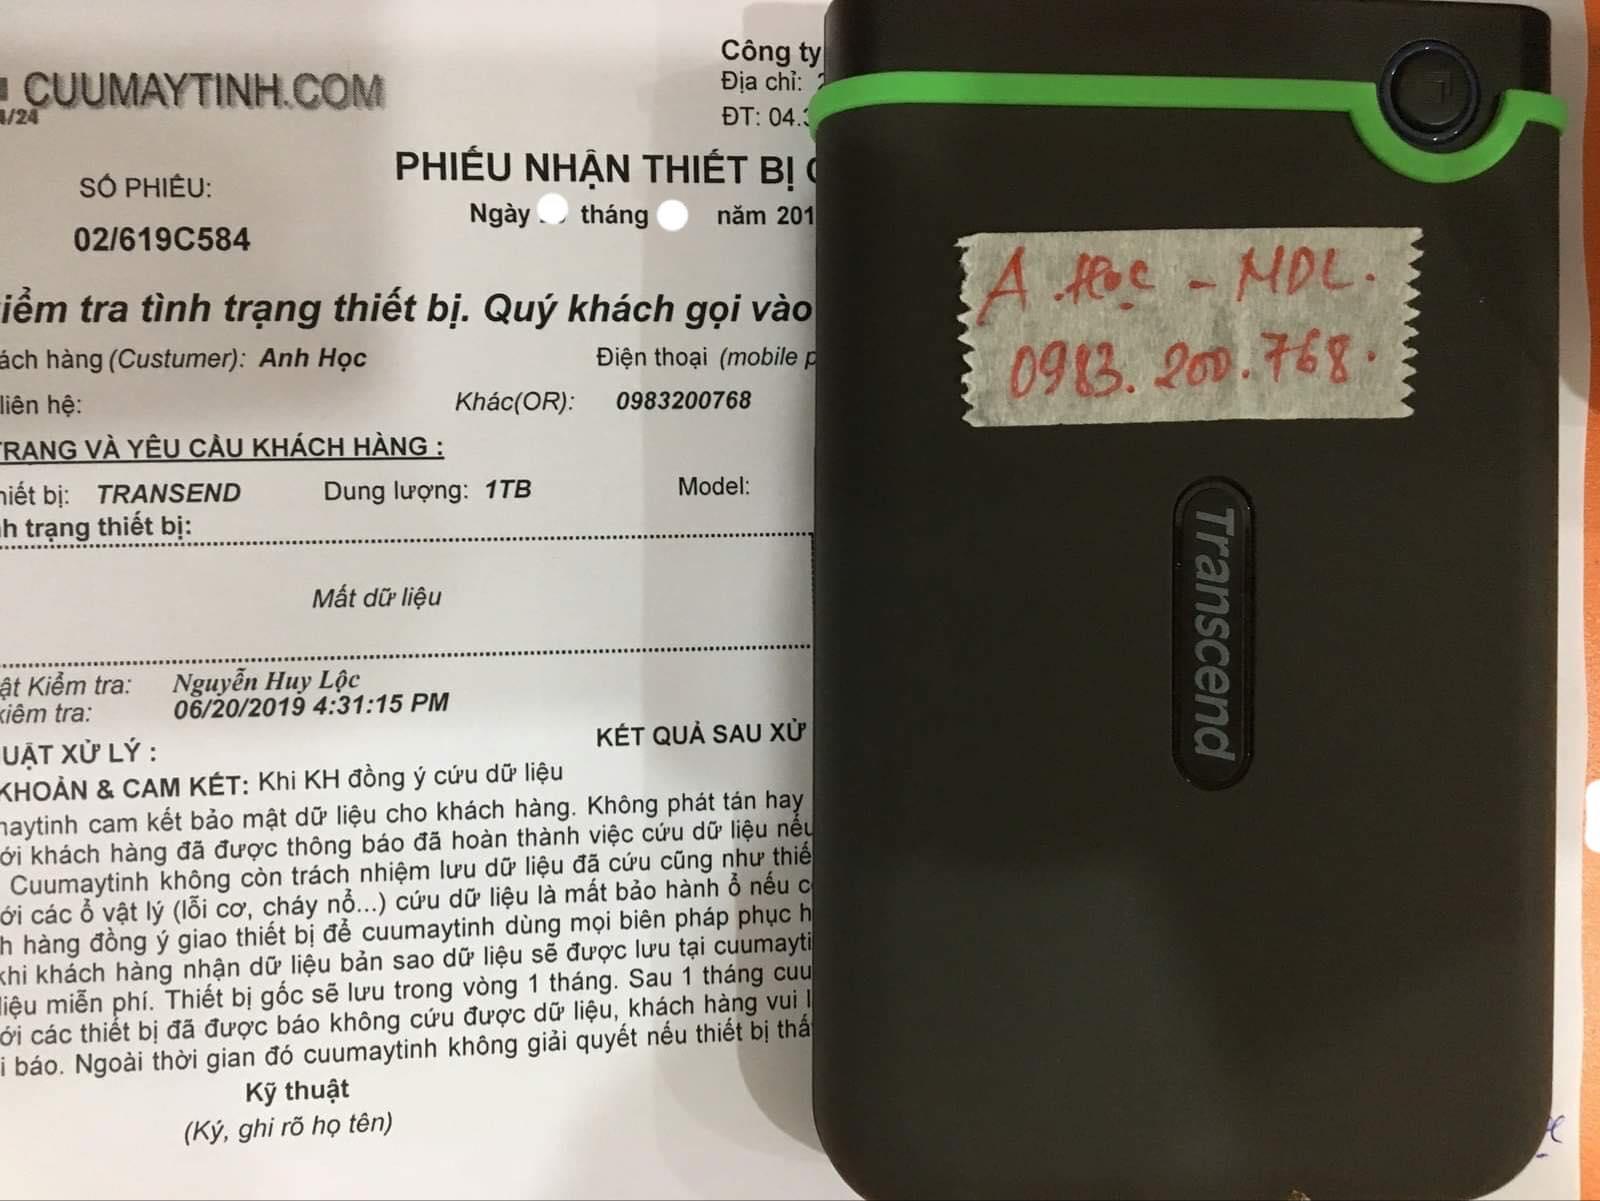 Lấy dữ liệu ổ cứng Box Transend 1TB format nhầm 02/07/2019 - cuumaytinh